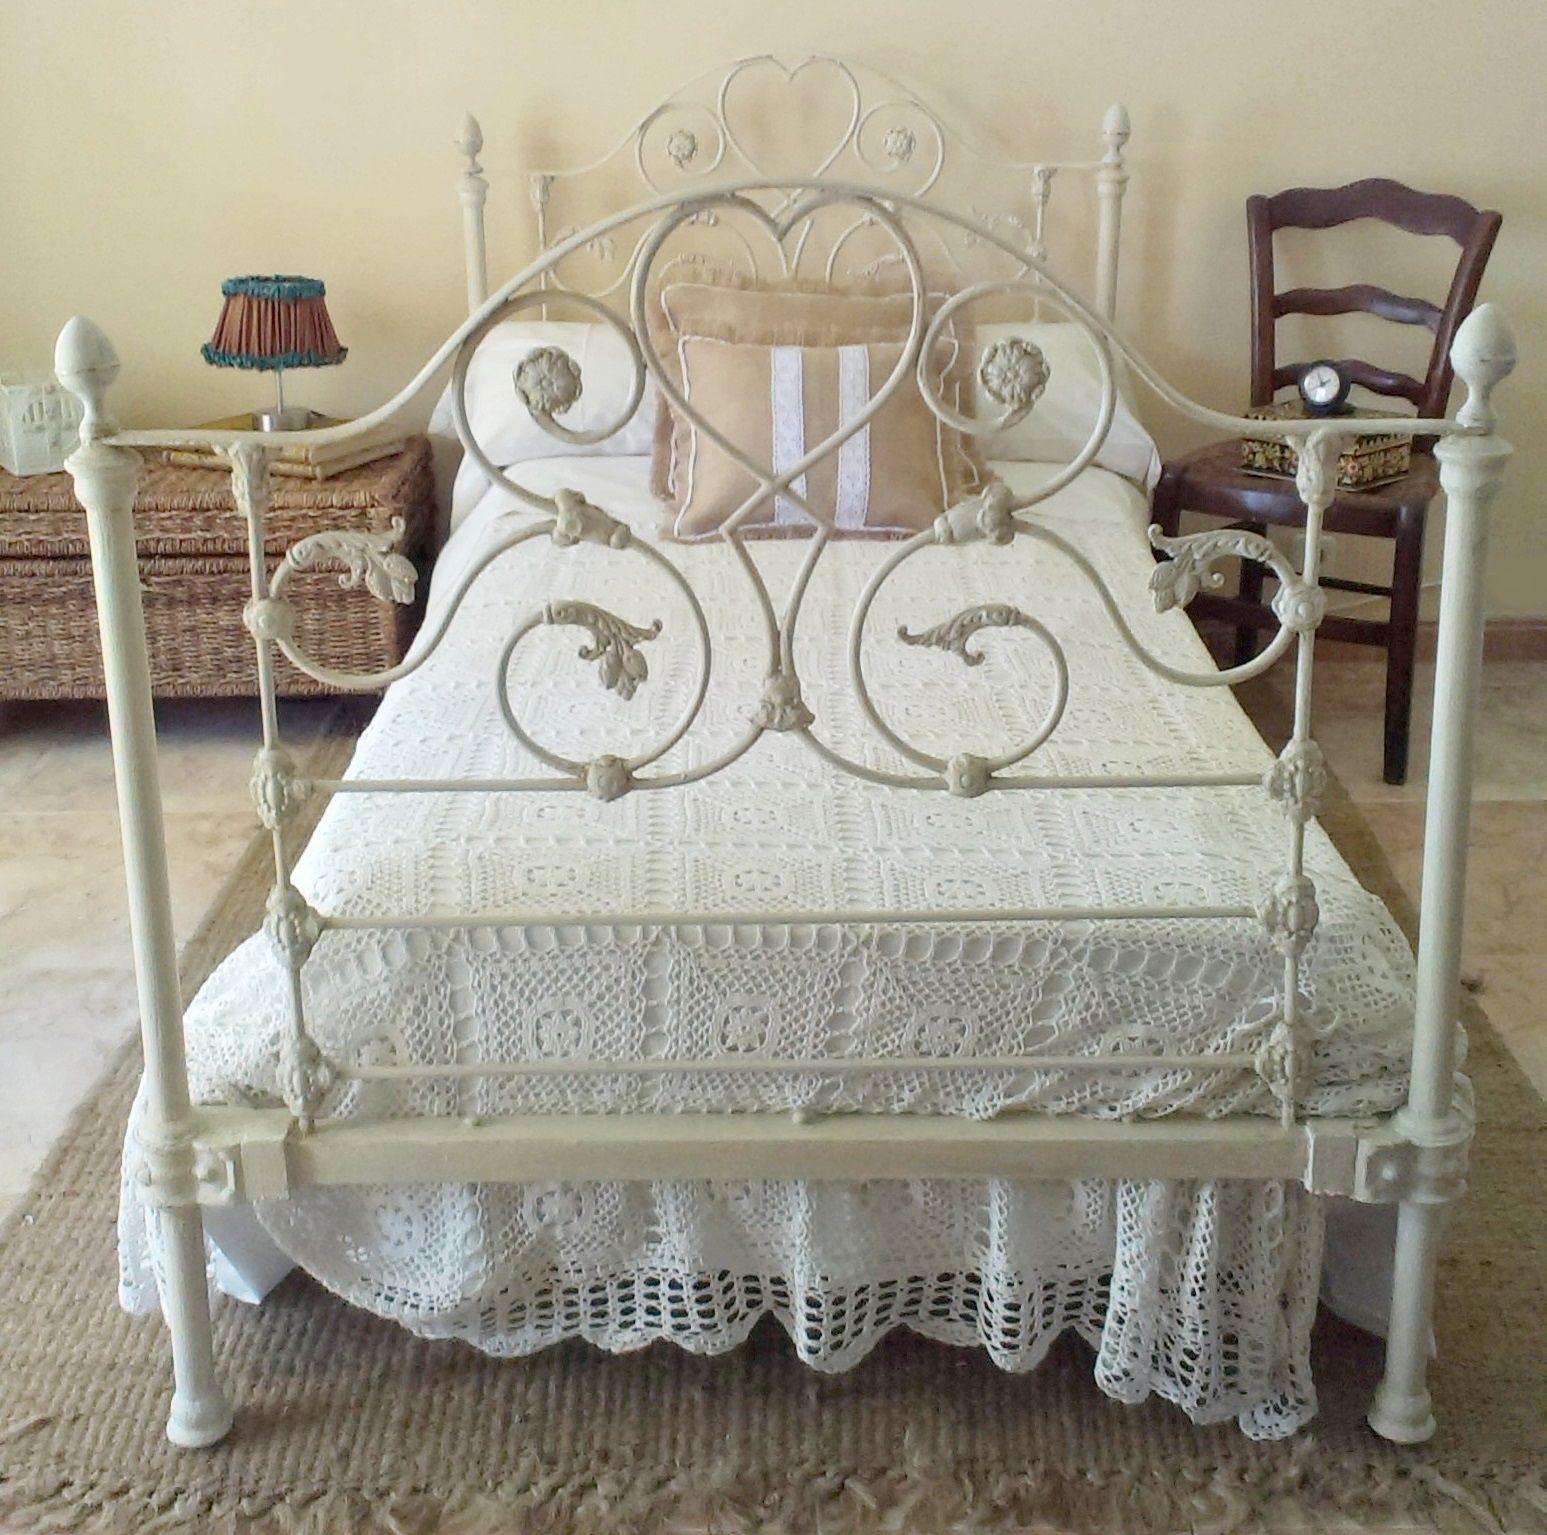 Antigua cama de forja estilo shabby shabby old iron bed - Camas antiguas de hierro ...